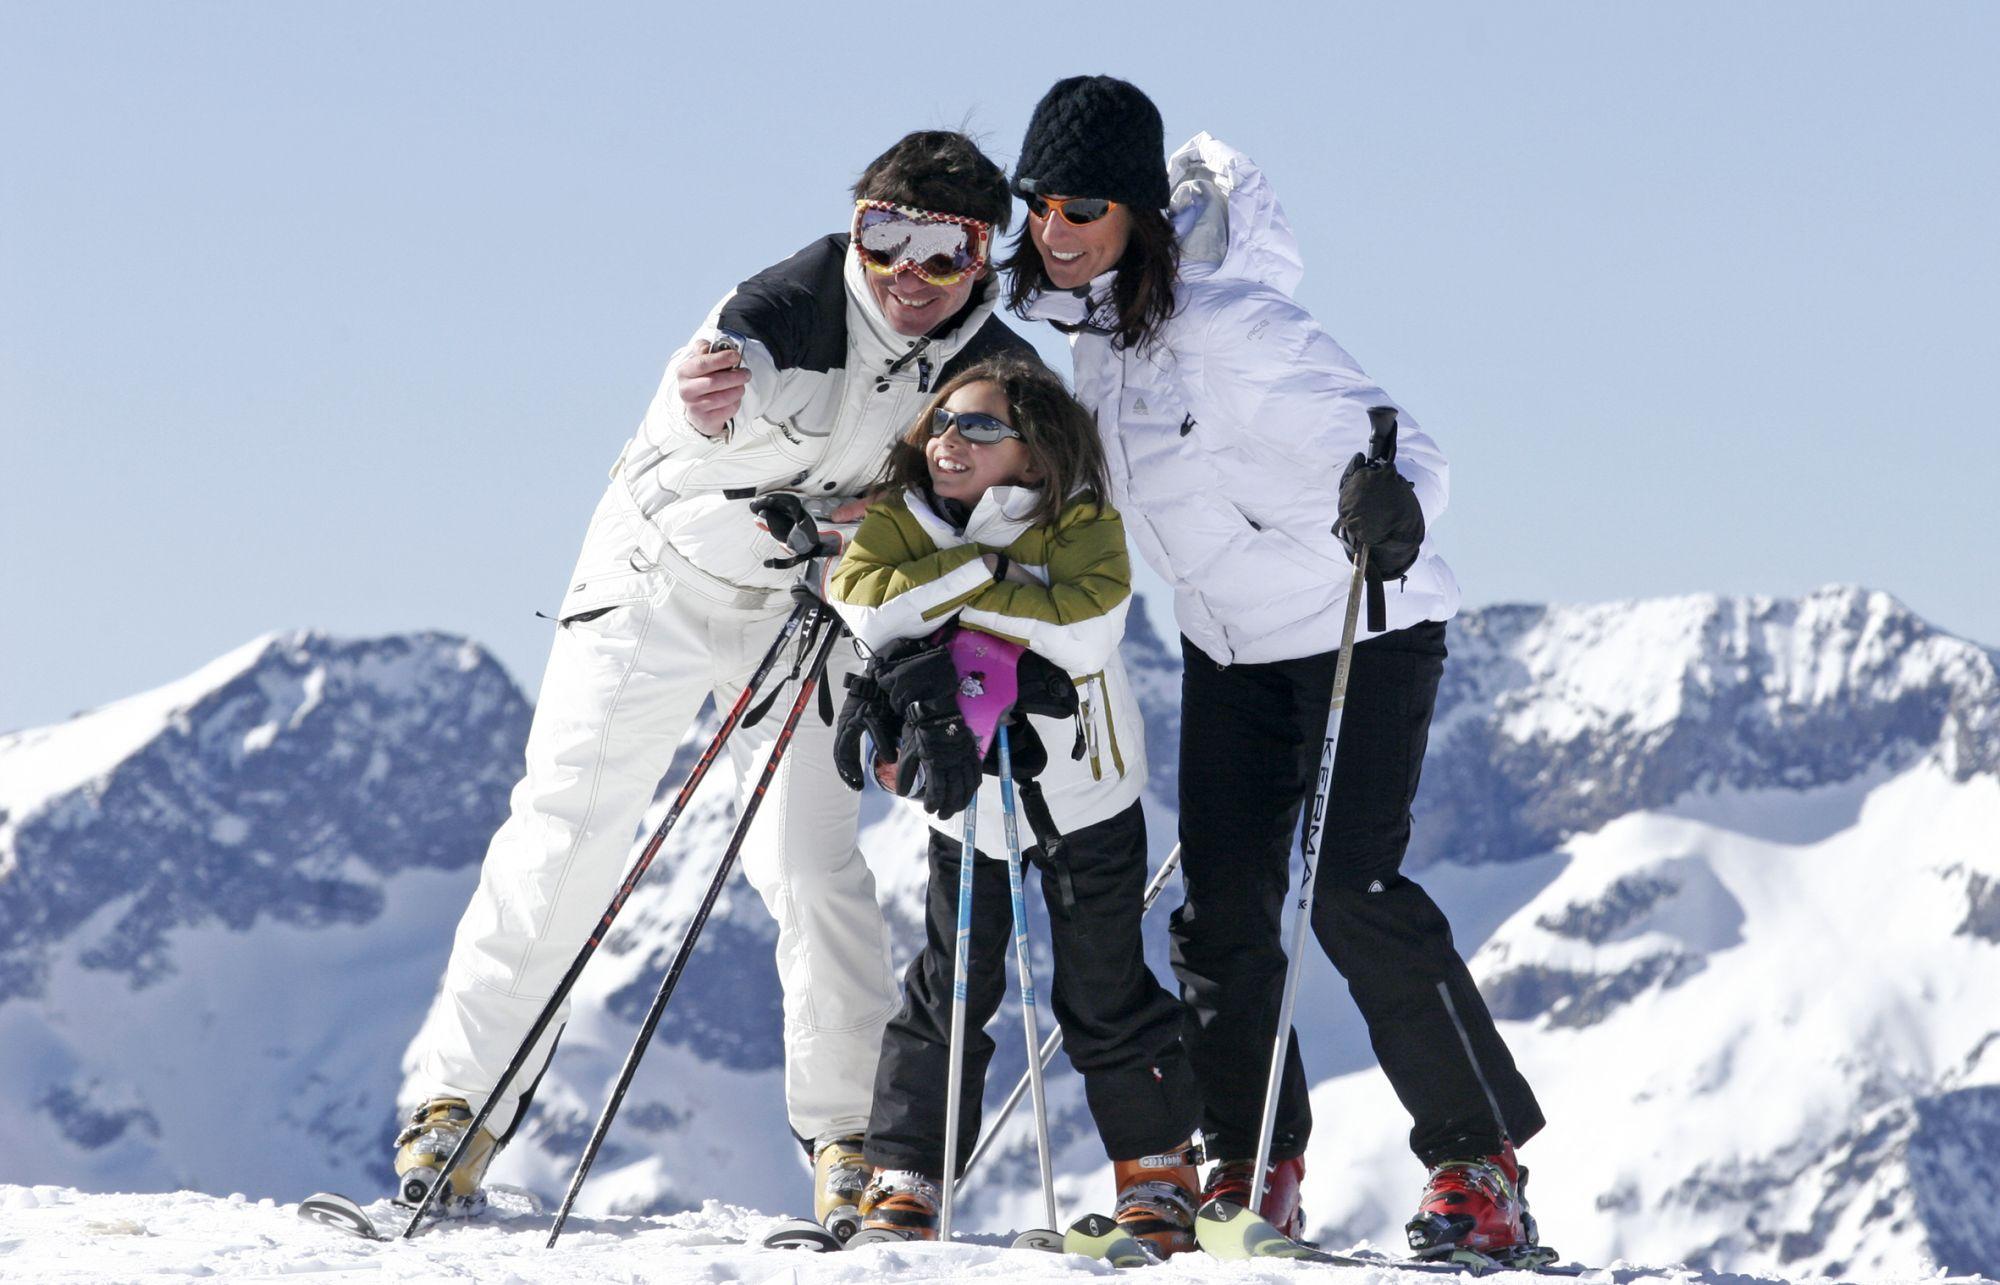 Famille - Bruno Longo - OT Les 2 Alpes